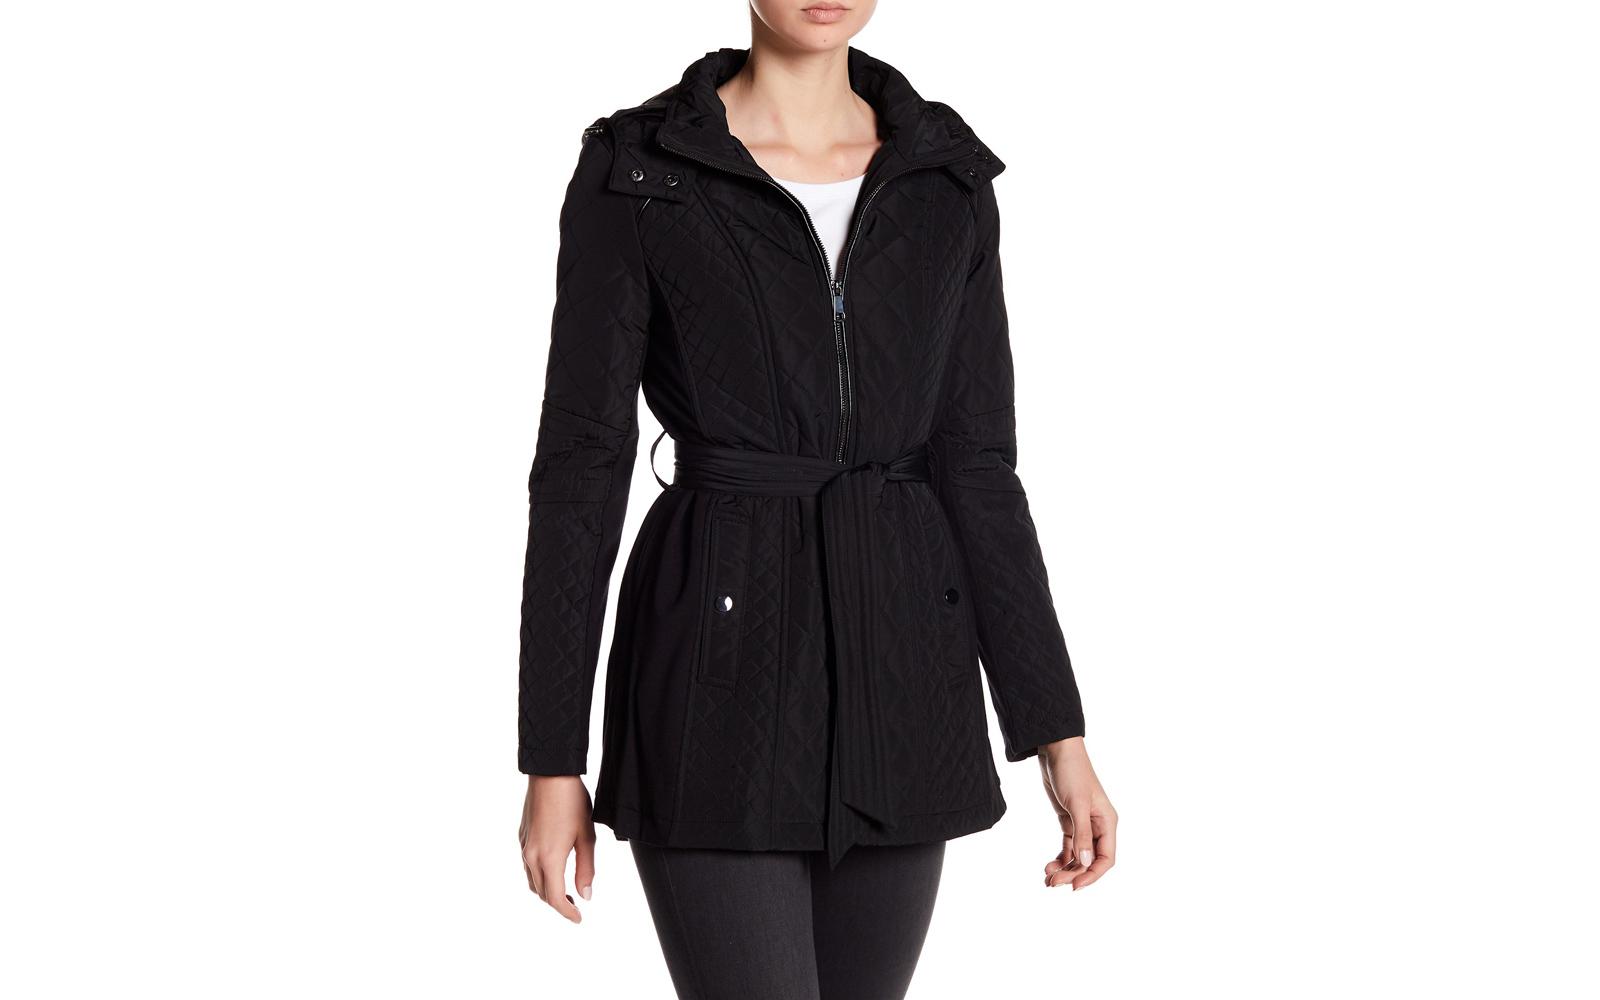 Nordstrom Rack Sebby Quilt Hooded Jacket